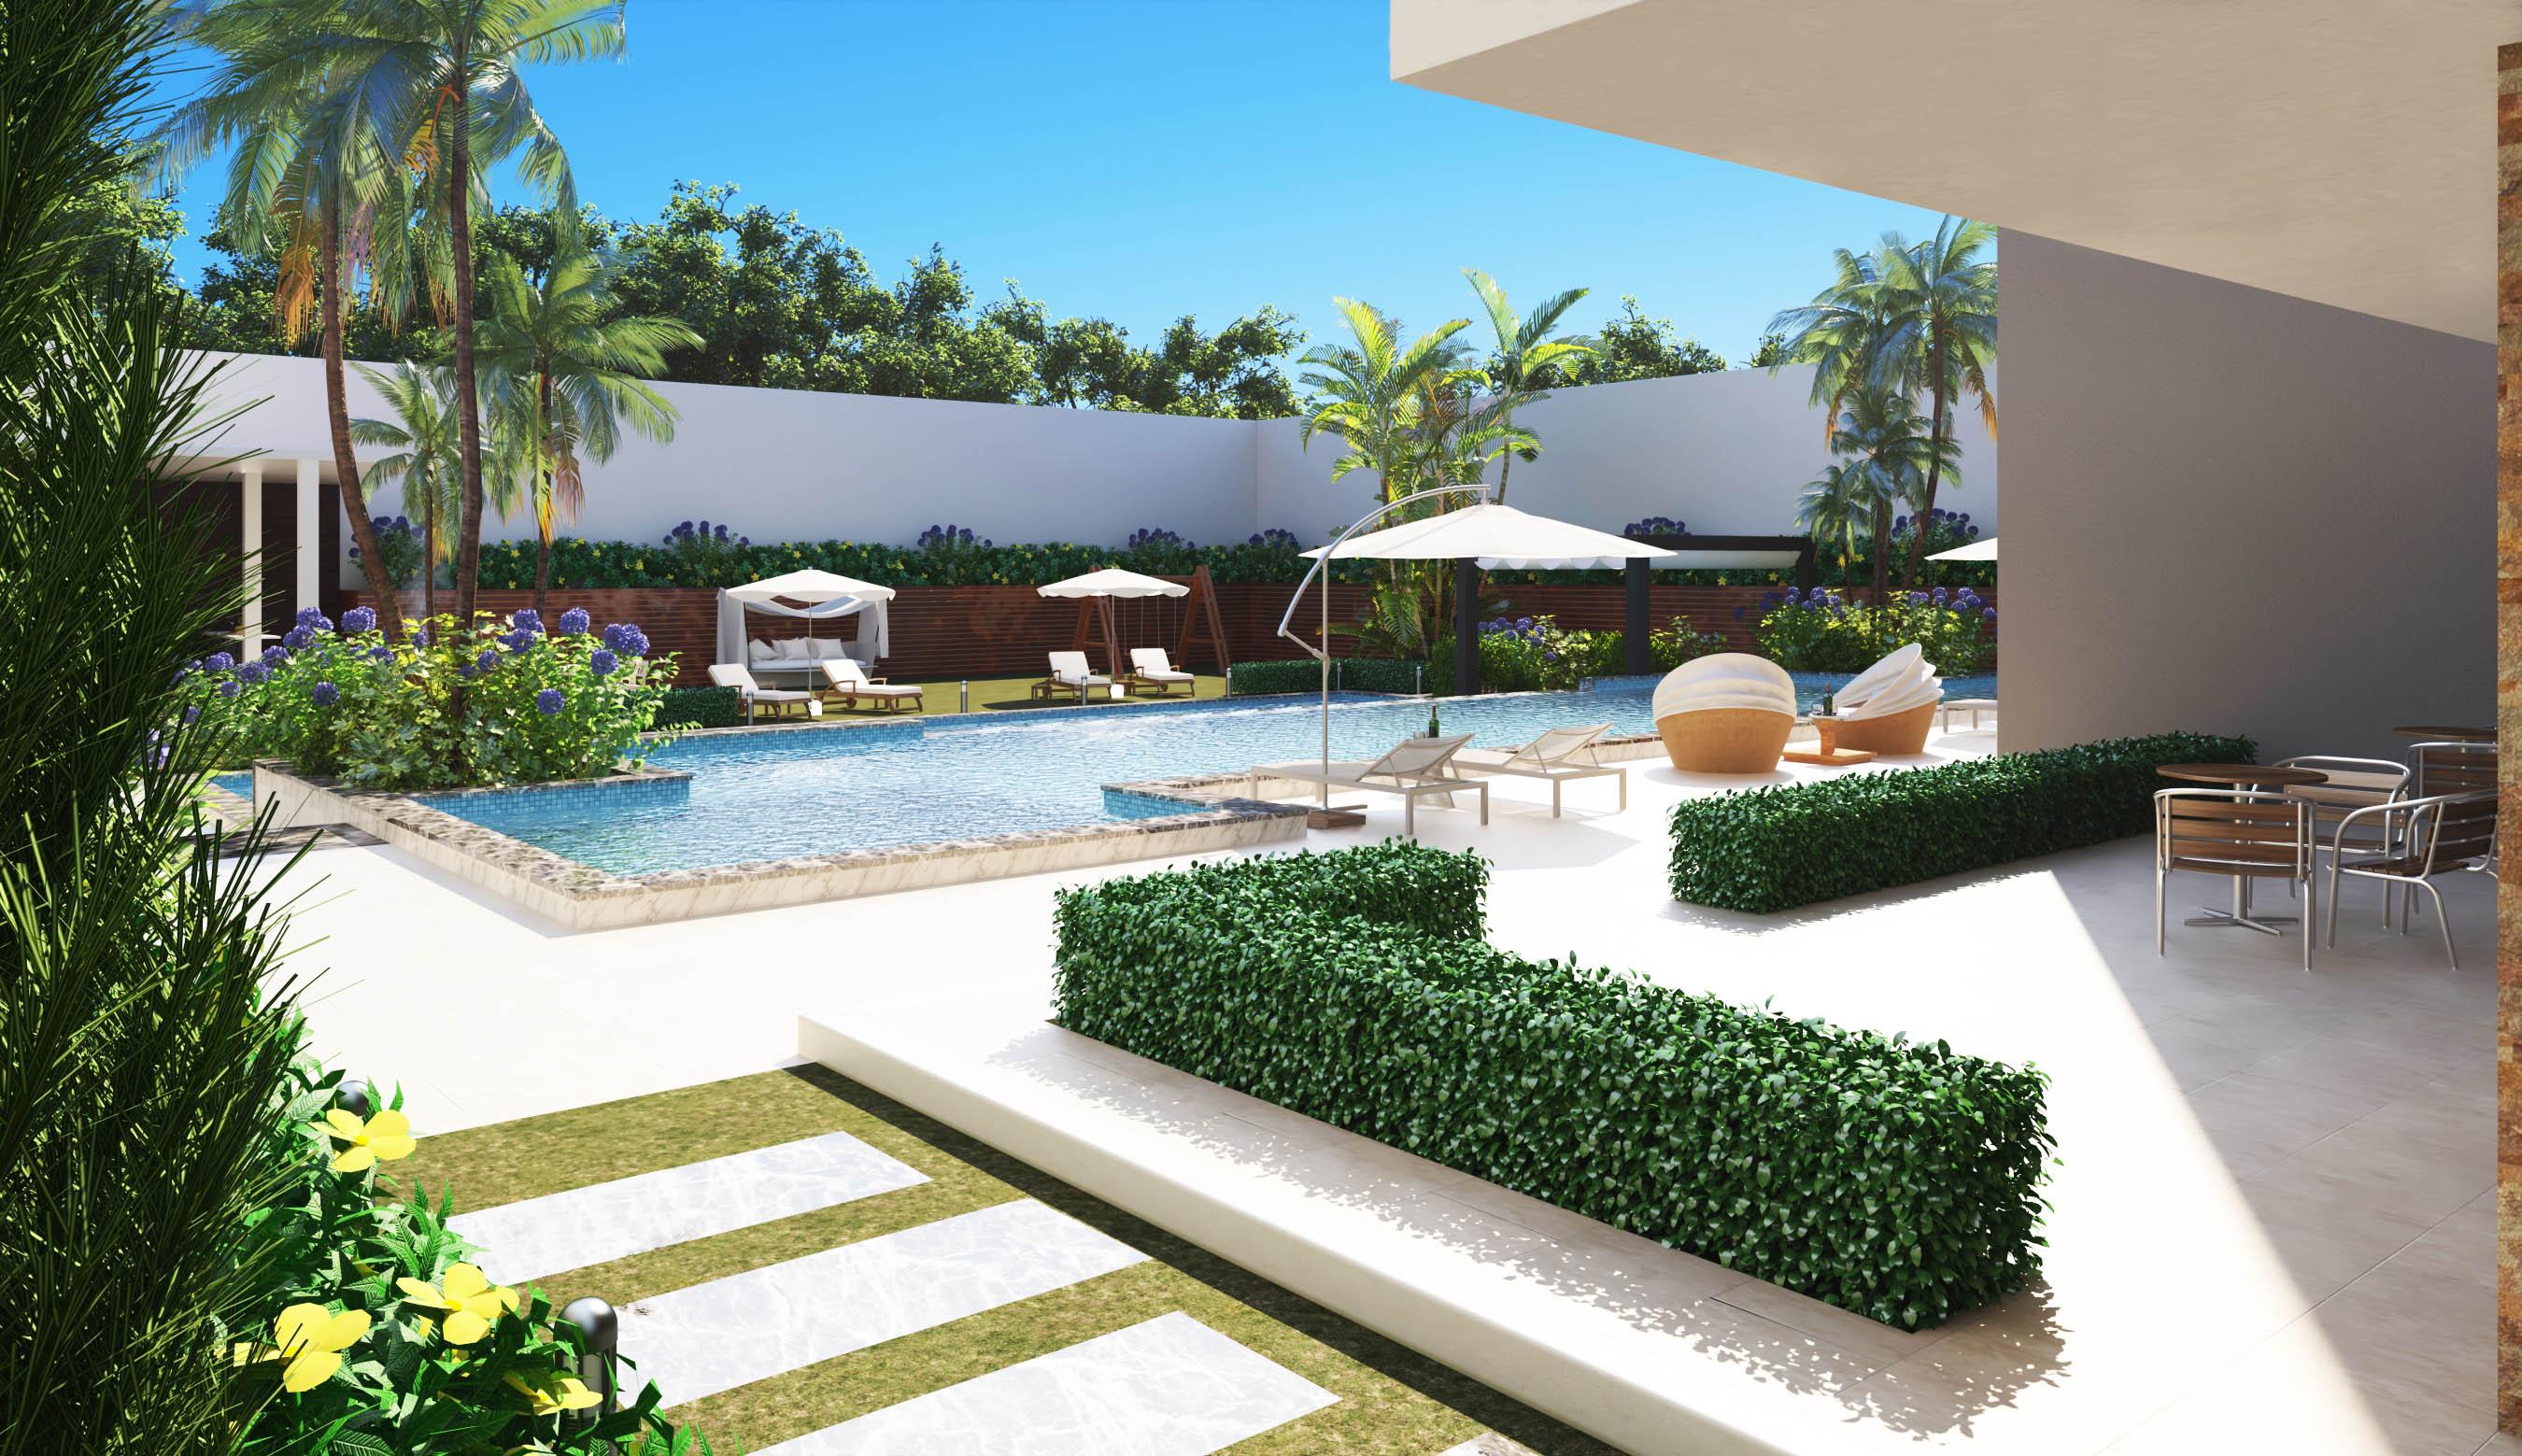 2 modern villa